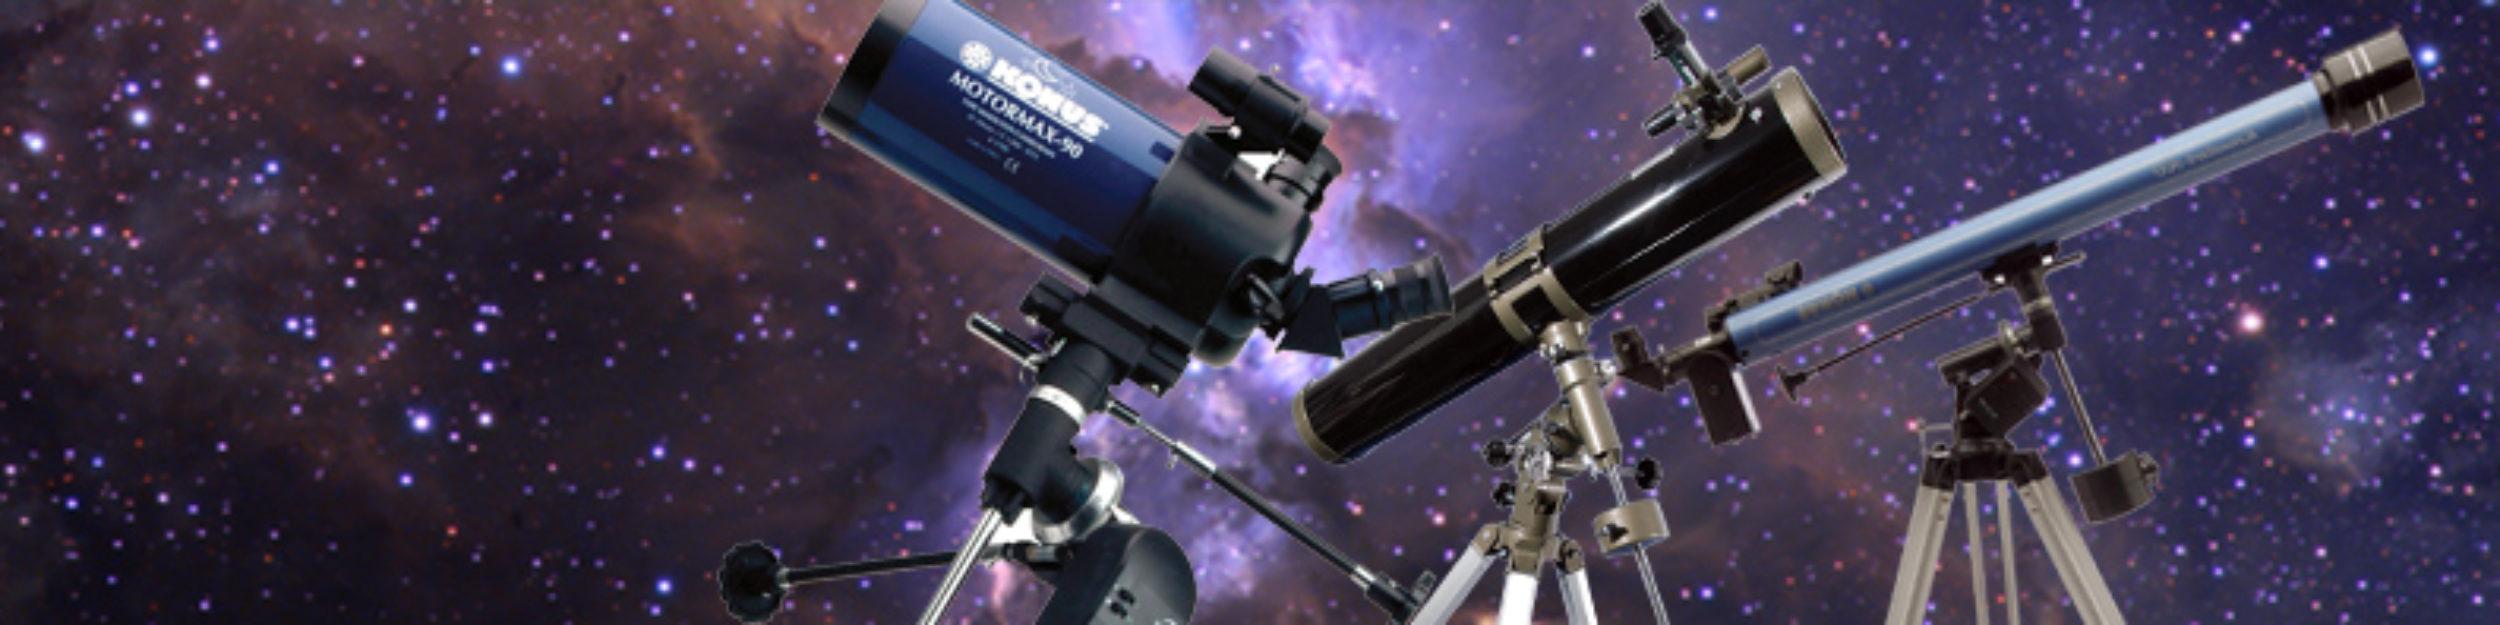 Telescopen.nl